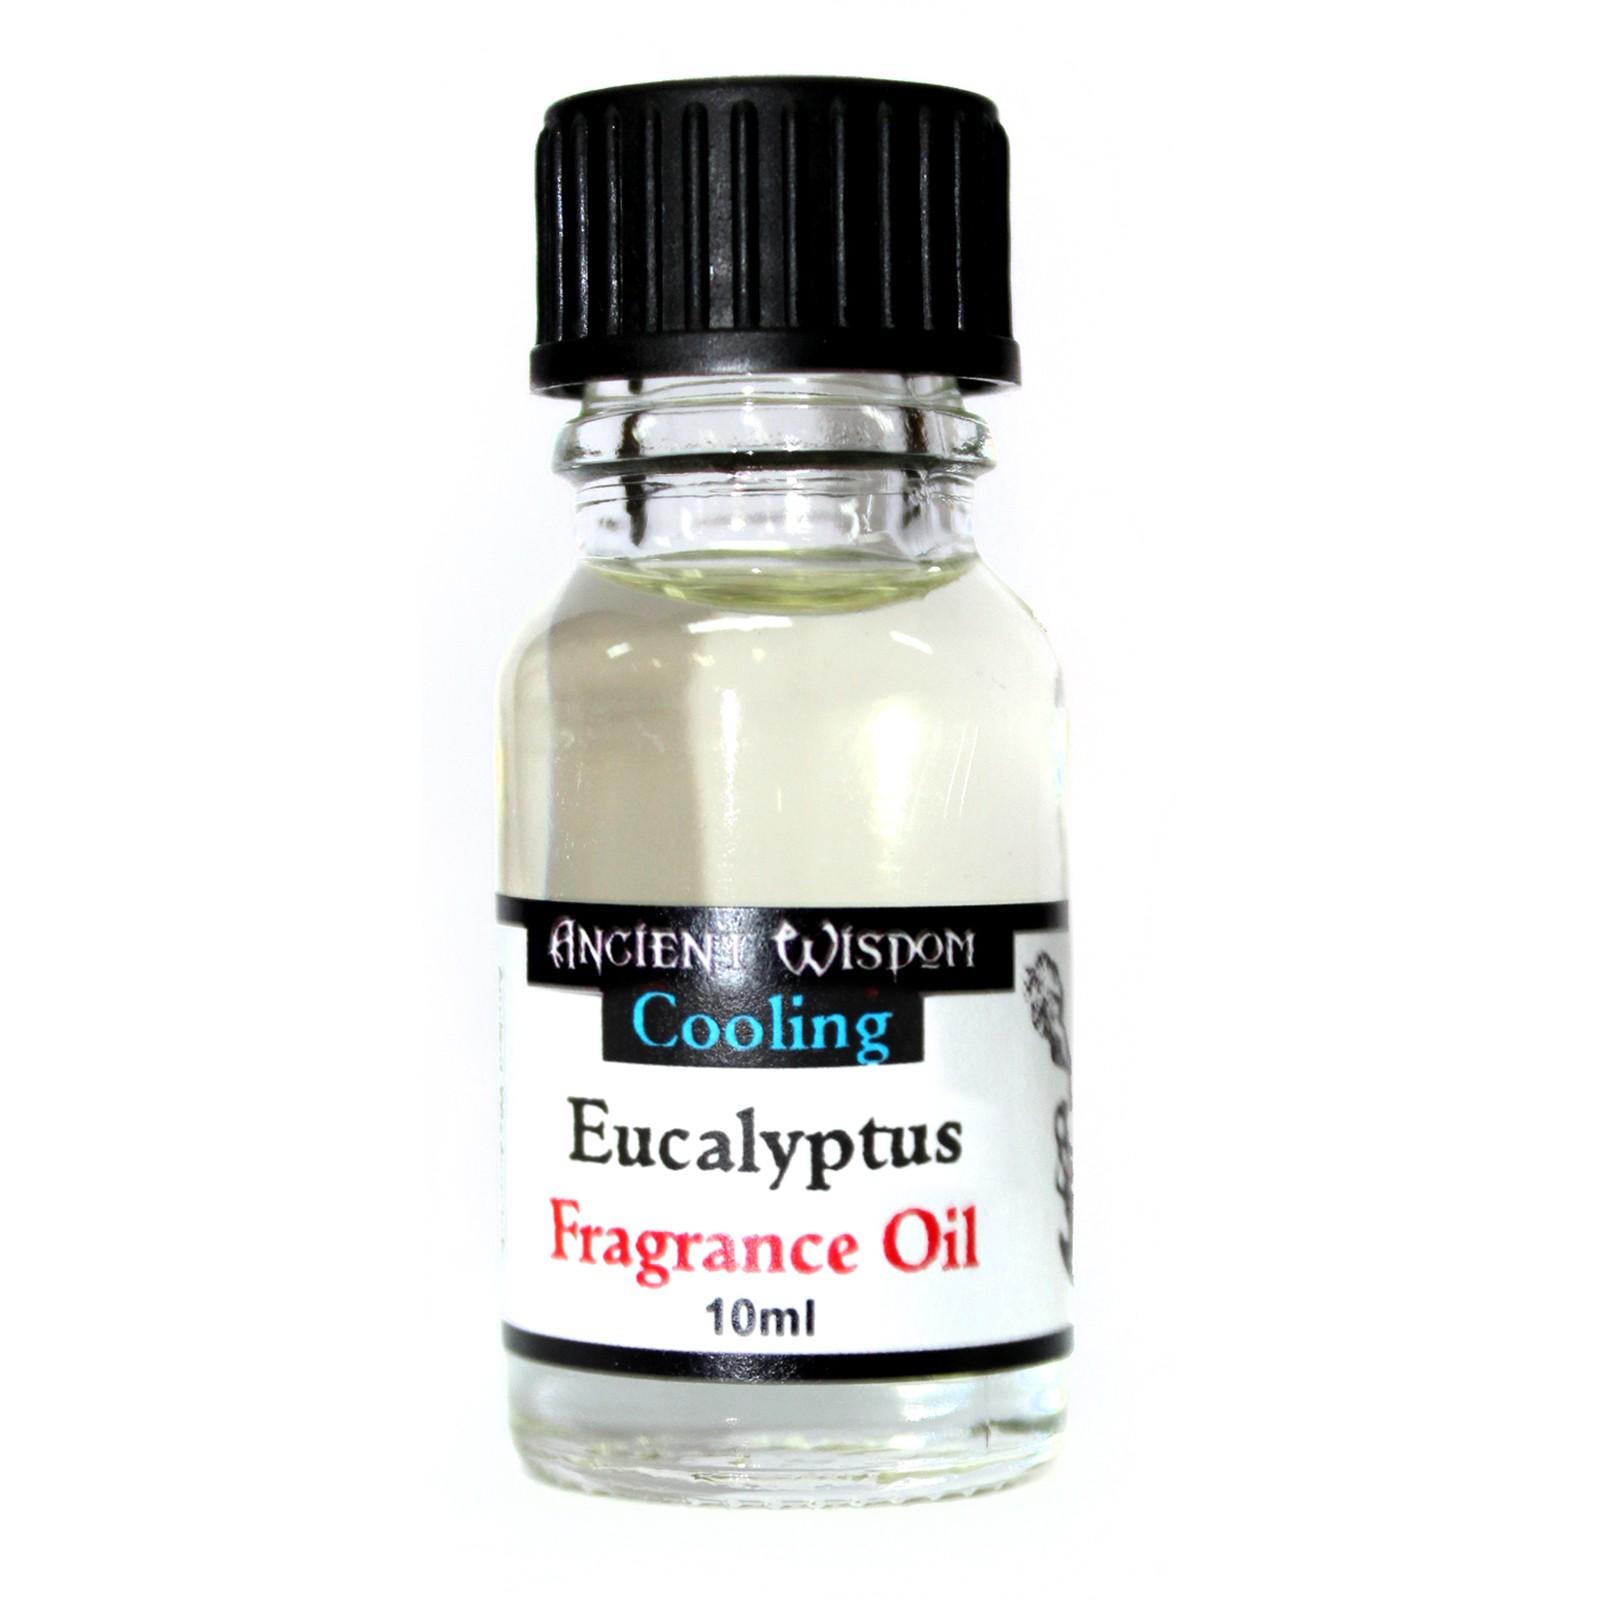 10ml Eucalyptus Fragrance Oil